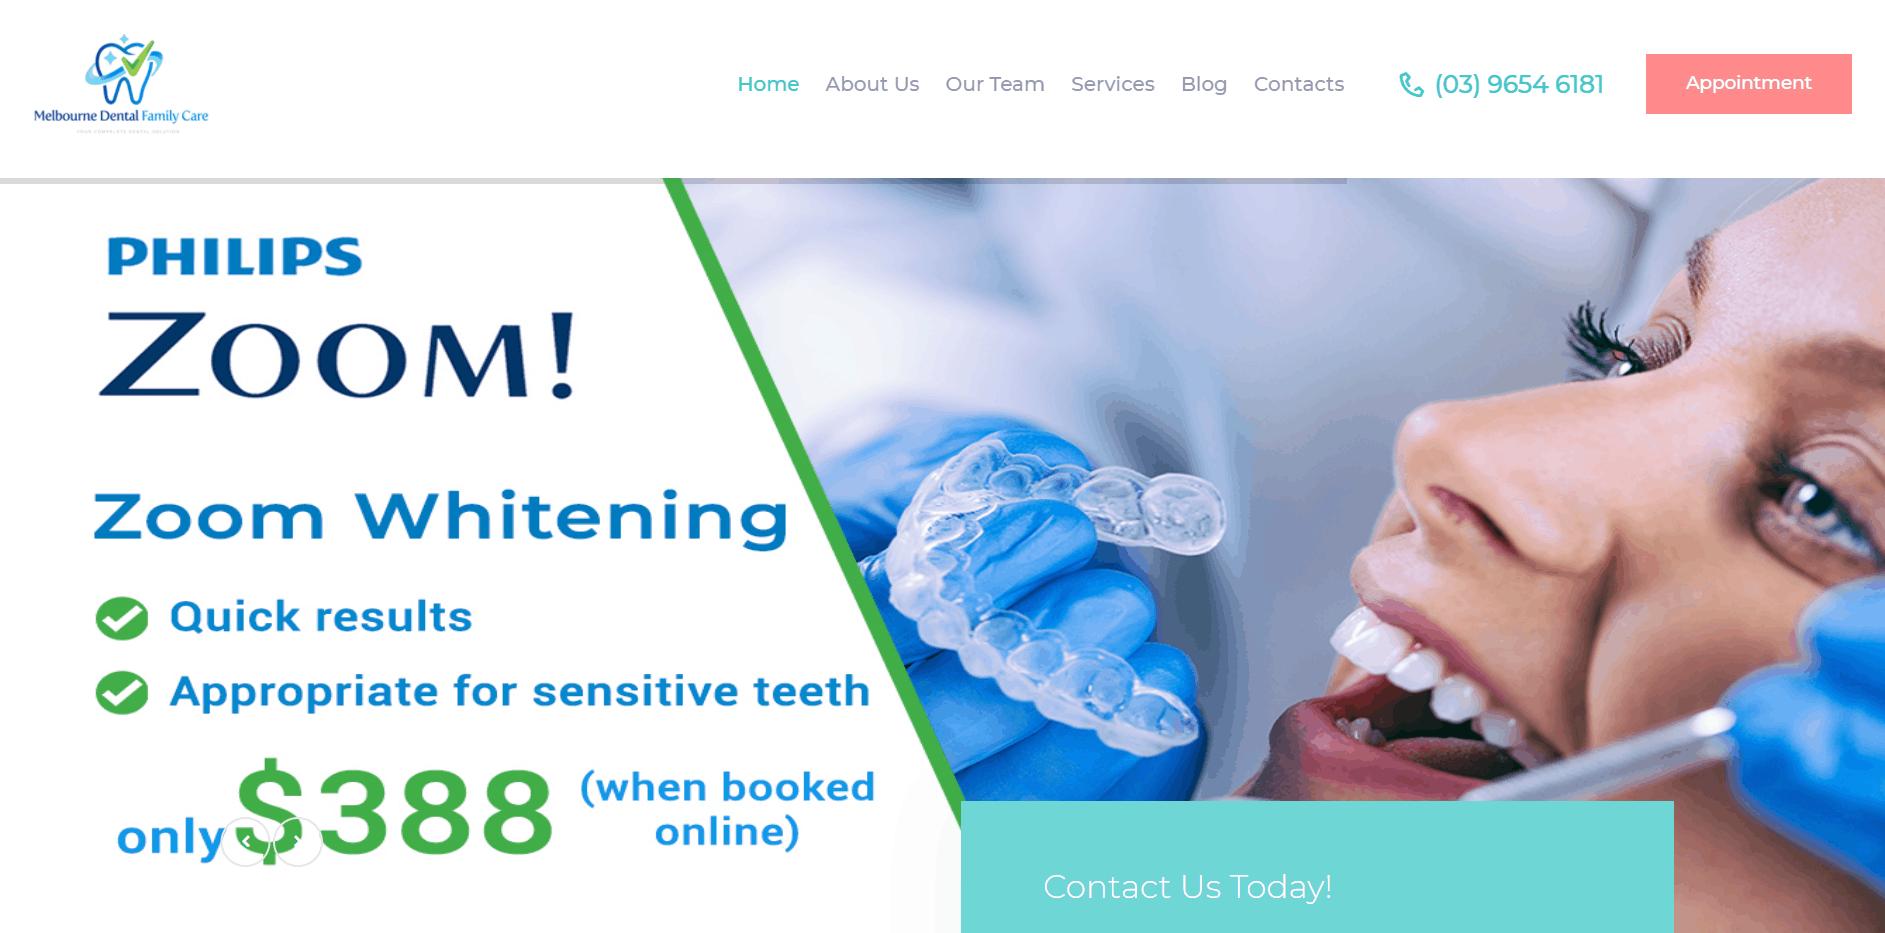 Melbourne Dental Family Care